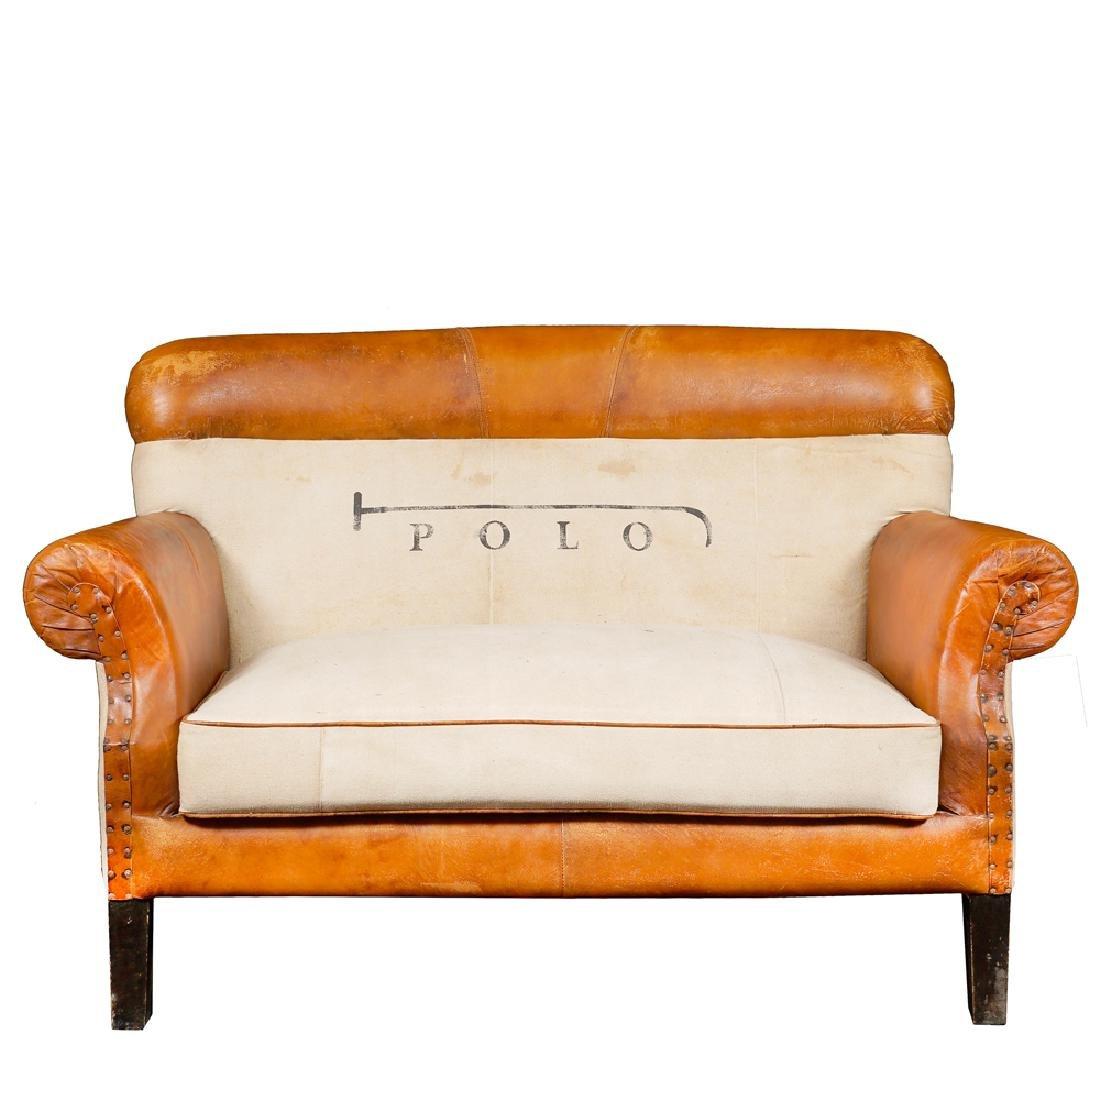 Polo sofa 20th century 95x143x75 cm.